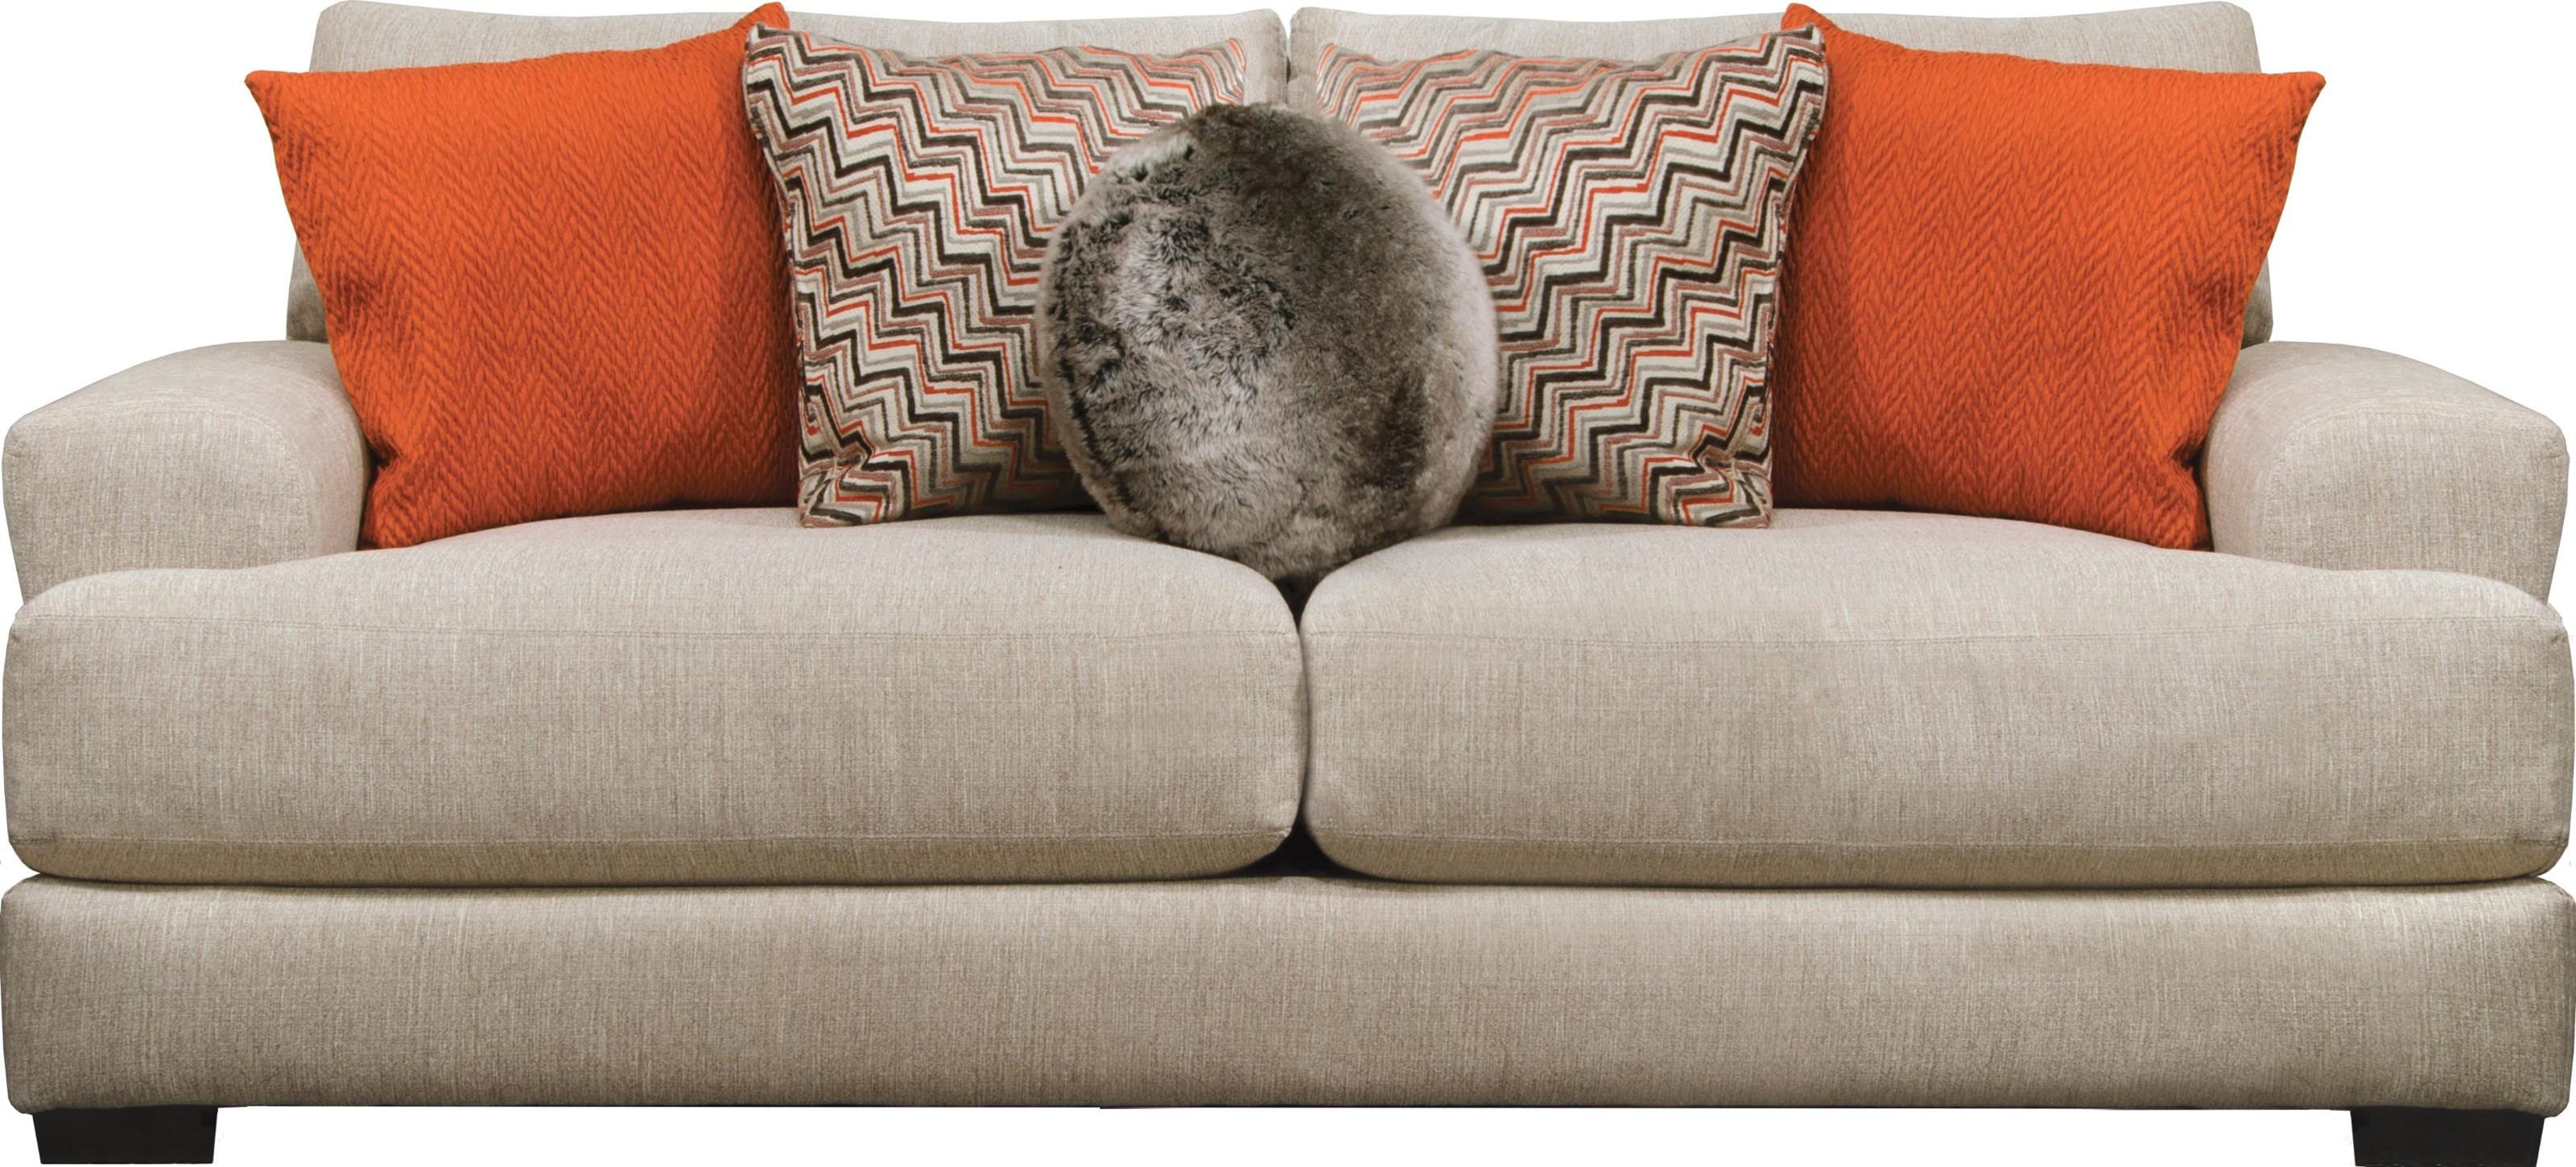 Jackson Furniture Ava Cashew Sofa - Item Number: 4498-03 1796-36